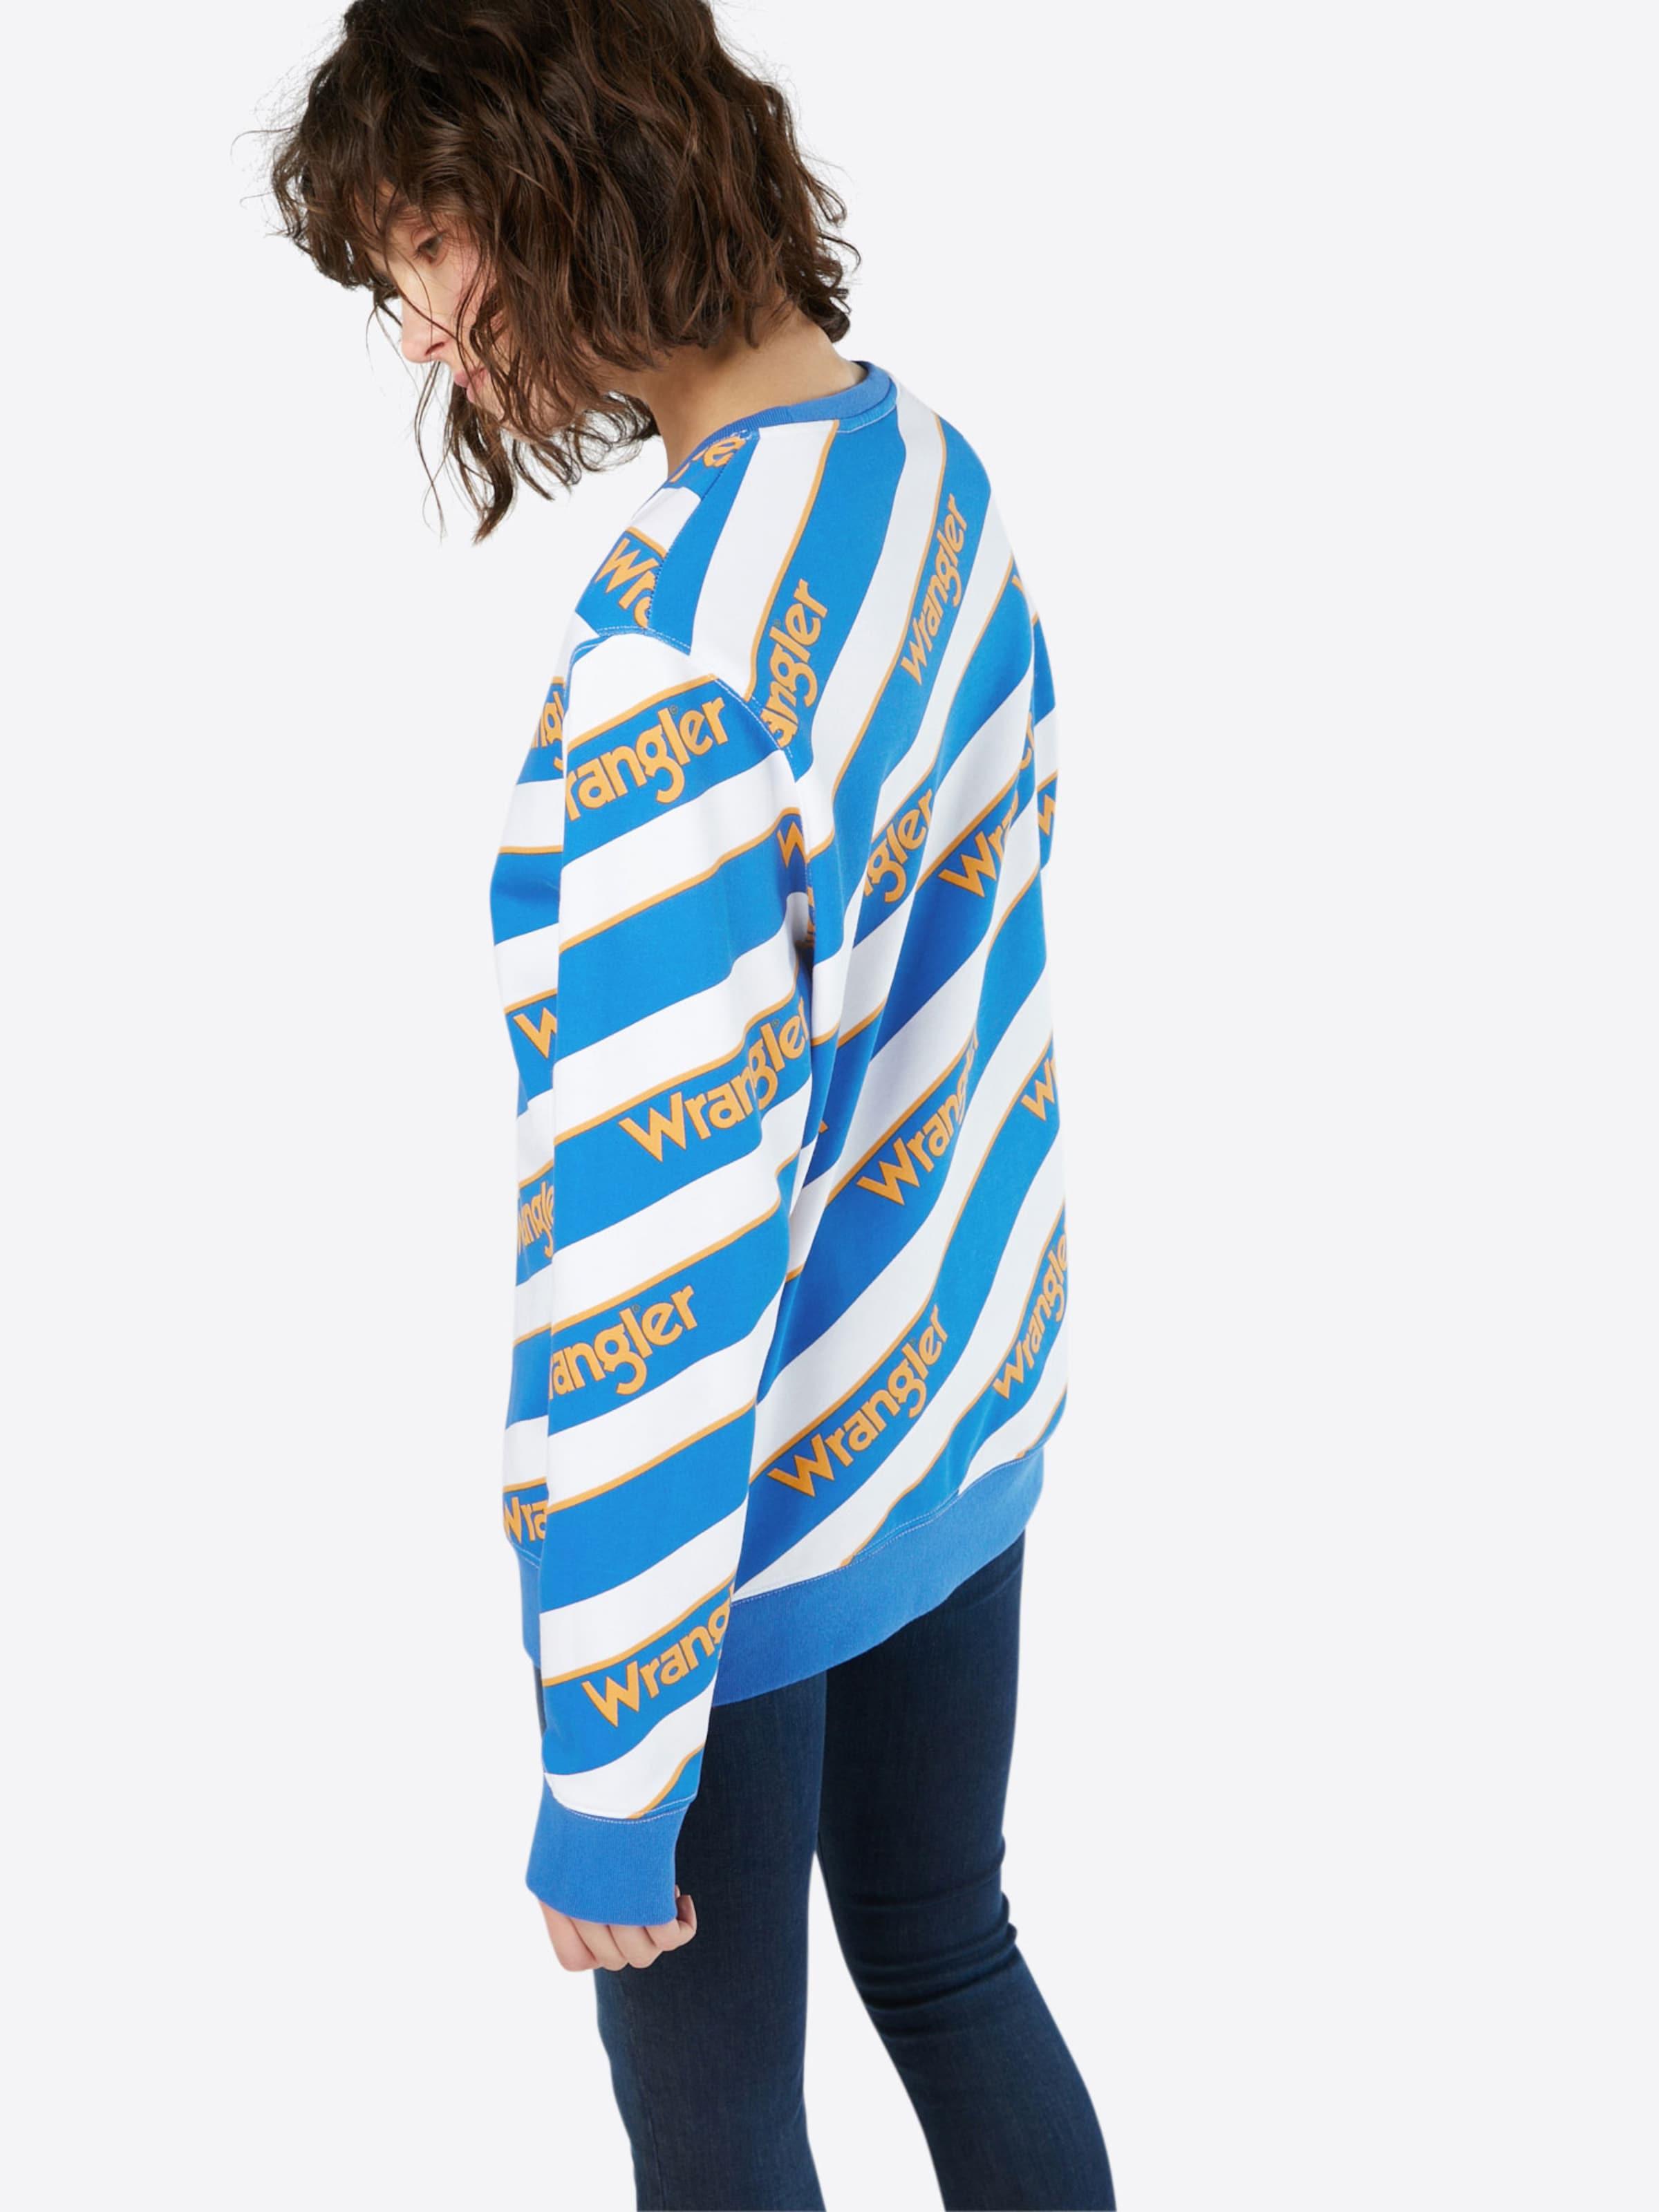 WRANGLER Sweatshirt 'B&Y' Verkauf Komfortabel Verkaufspreise LXu8Rl4xI